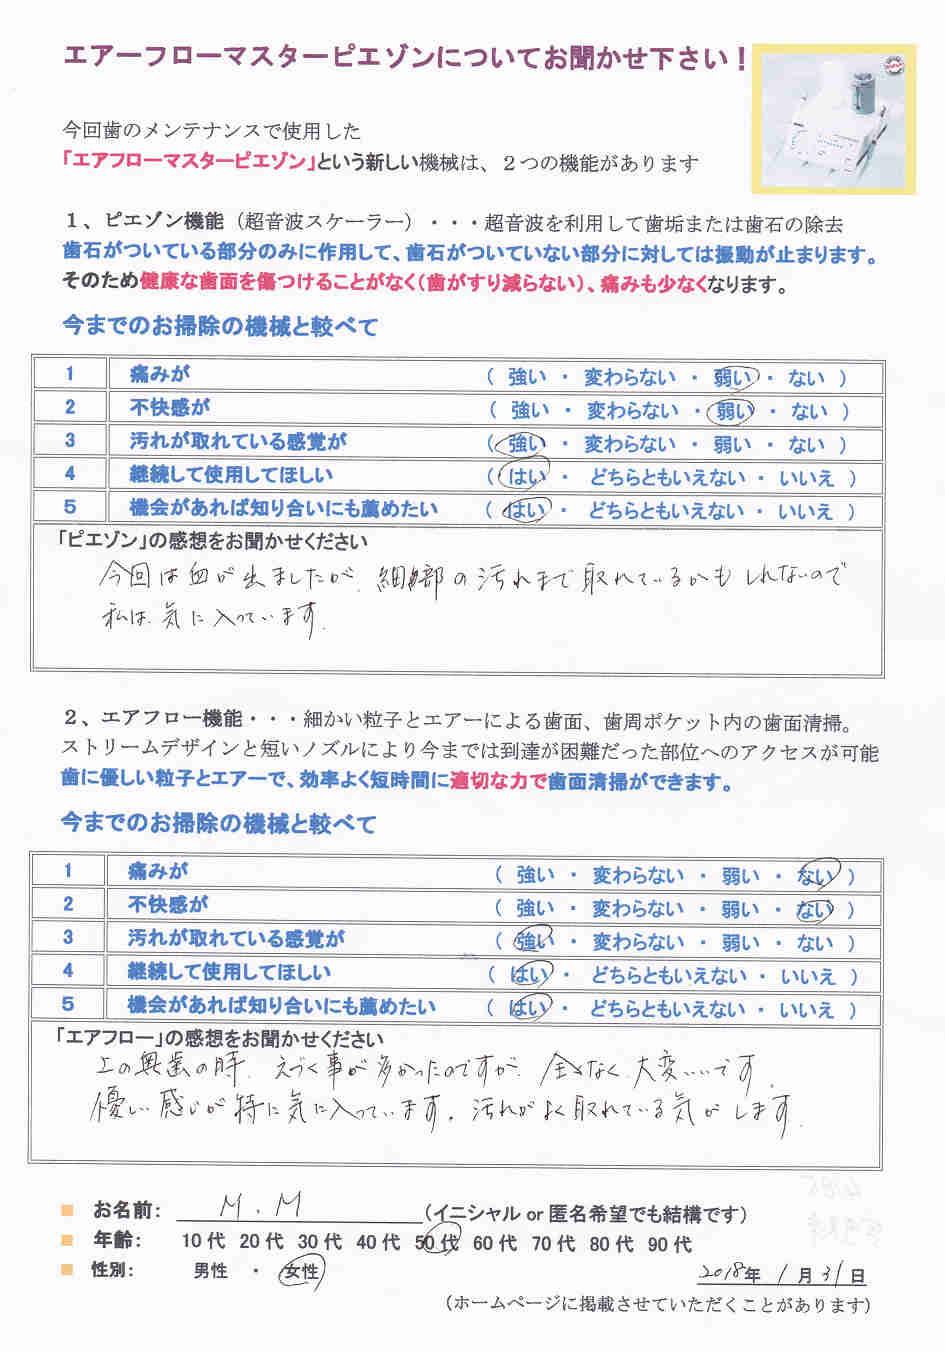 http://www.hayashi-dental.info/miyazaki.jpg